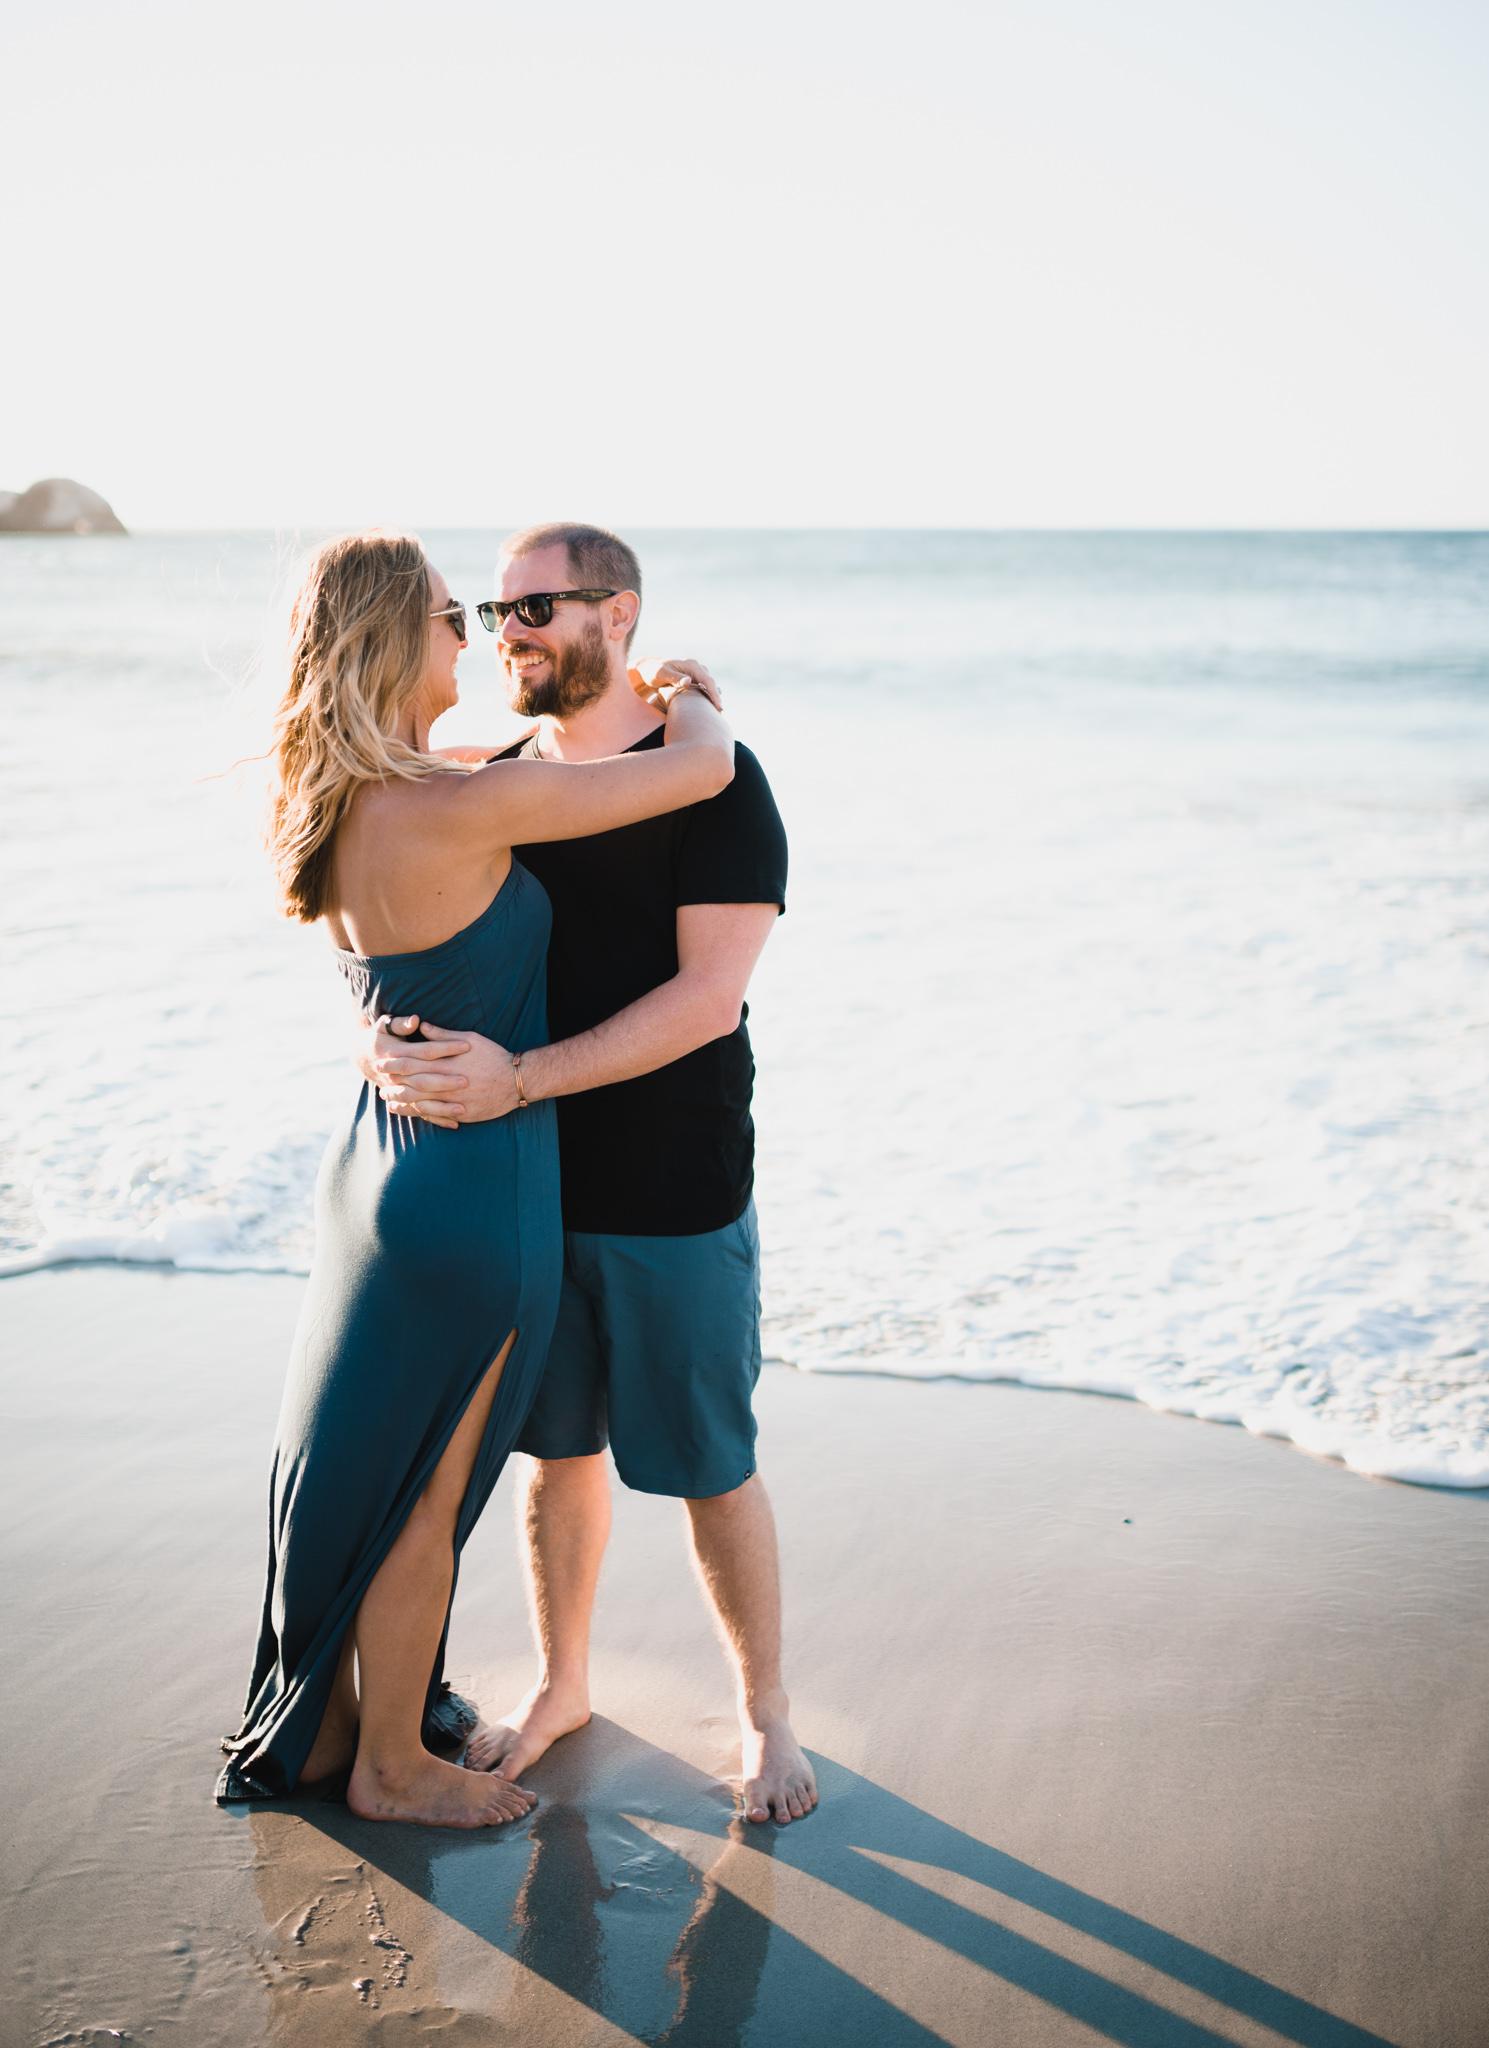 Ross & Candice engagement (17 of 166).JPG